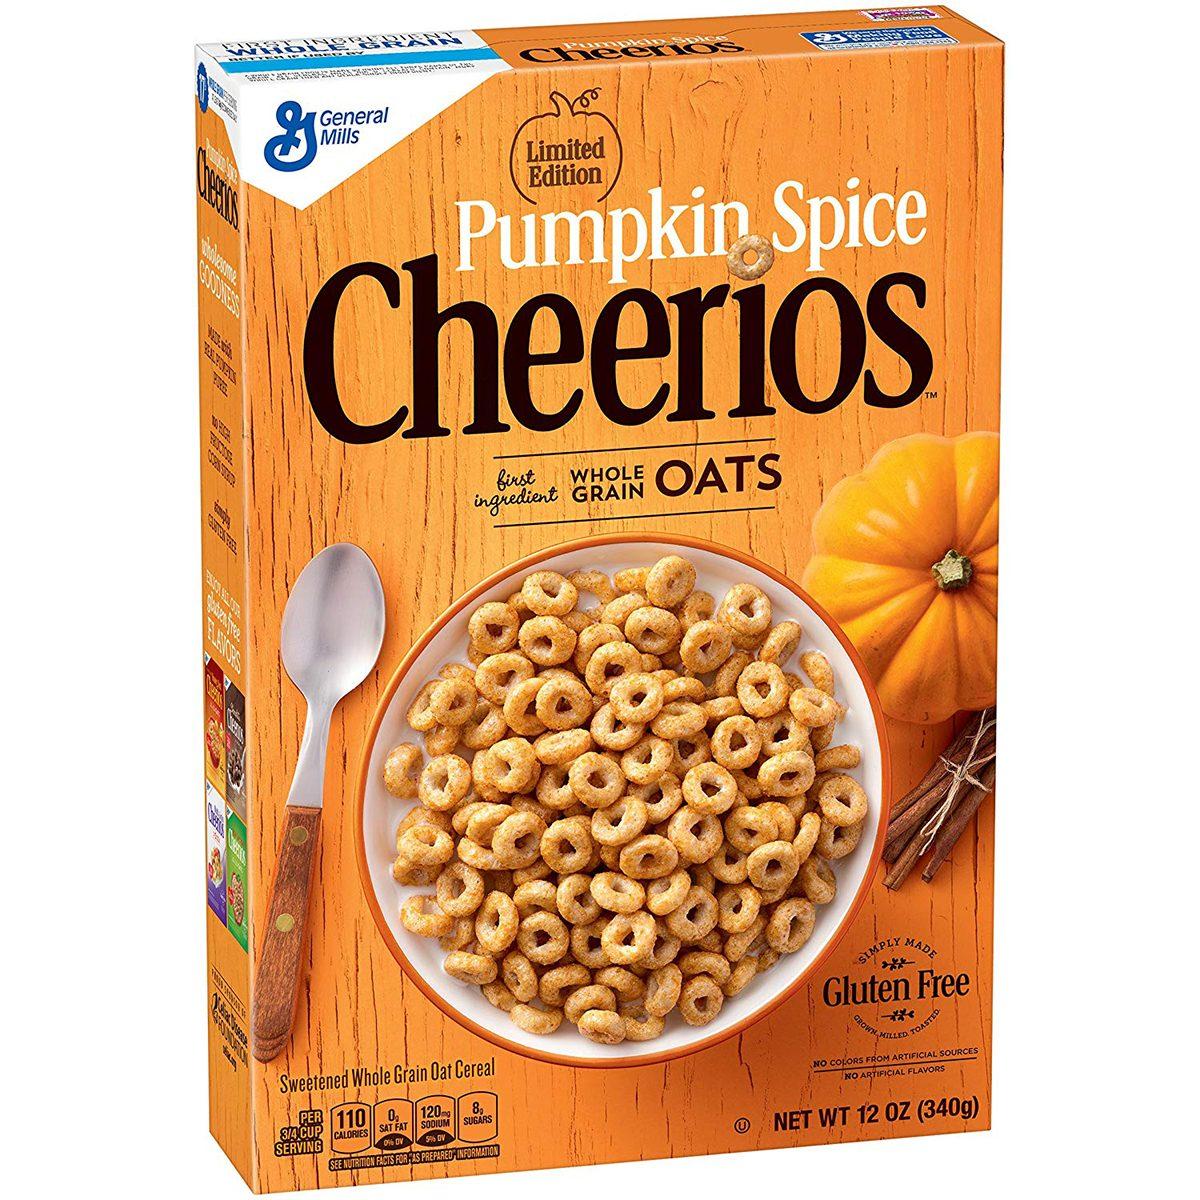 pumpkin spice cereal